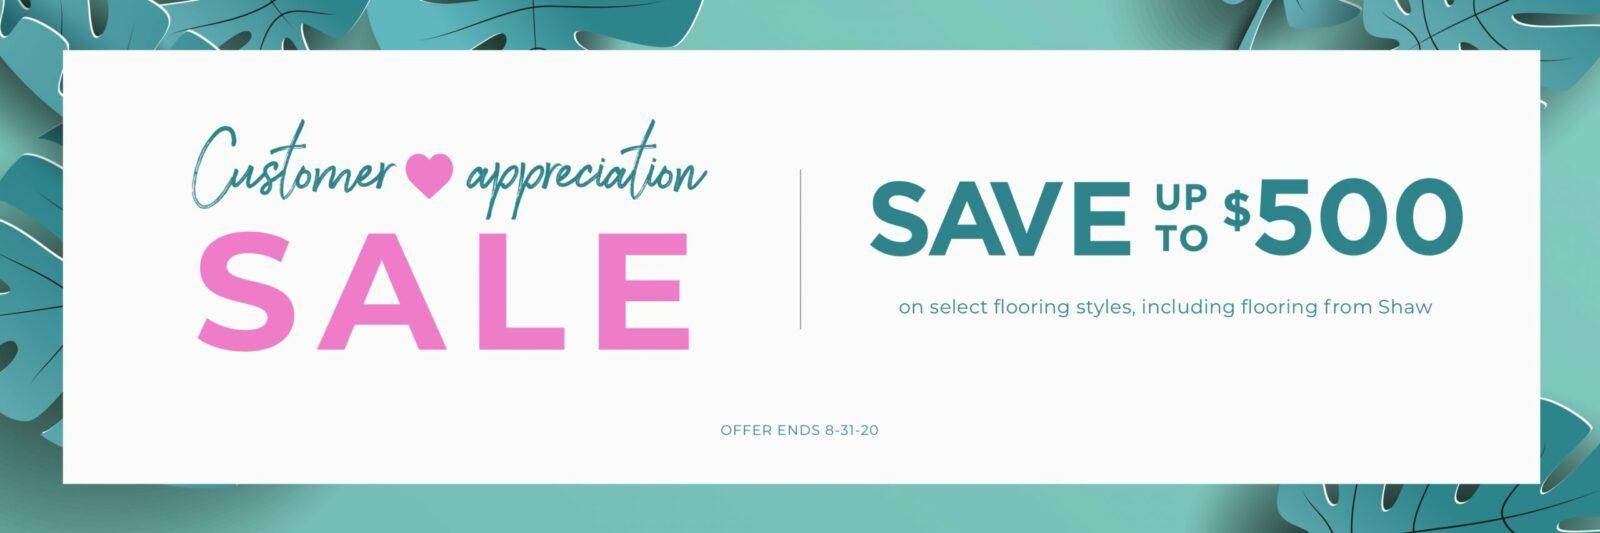 Customer appreciation sale | Staff Carpet